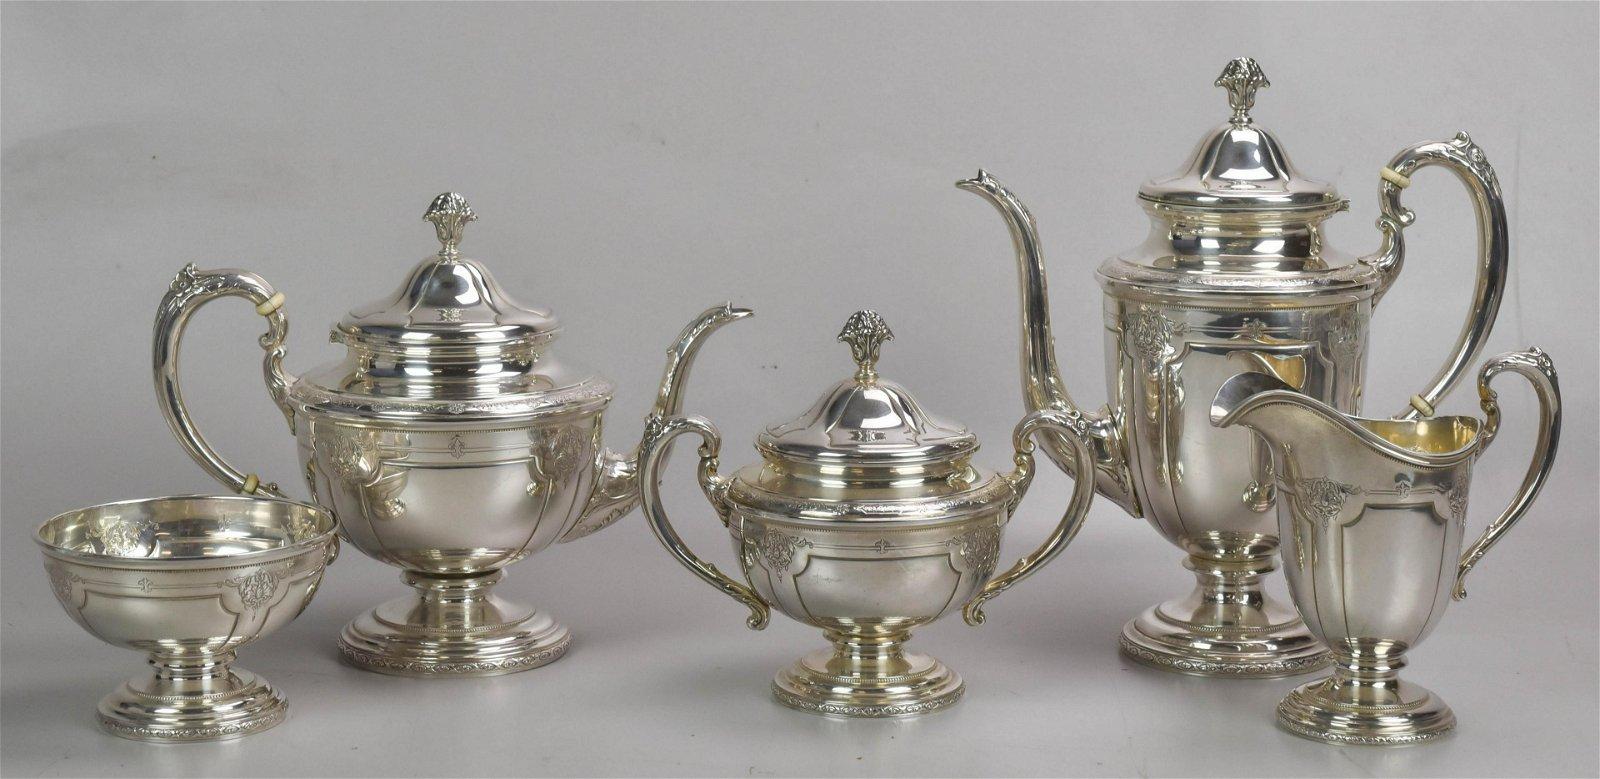 5-Pc Towle Sterling Silver Tea Set